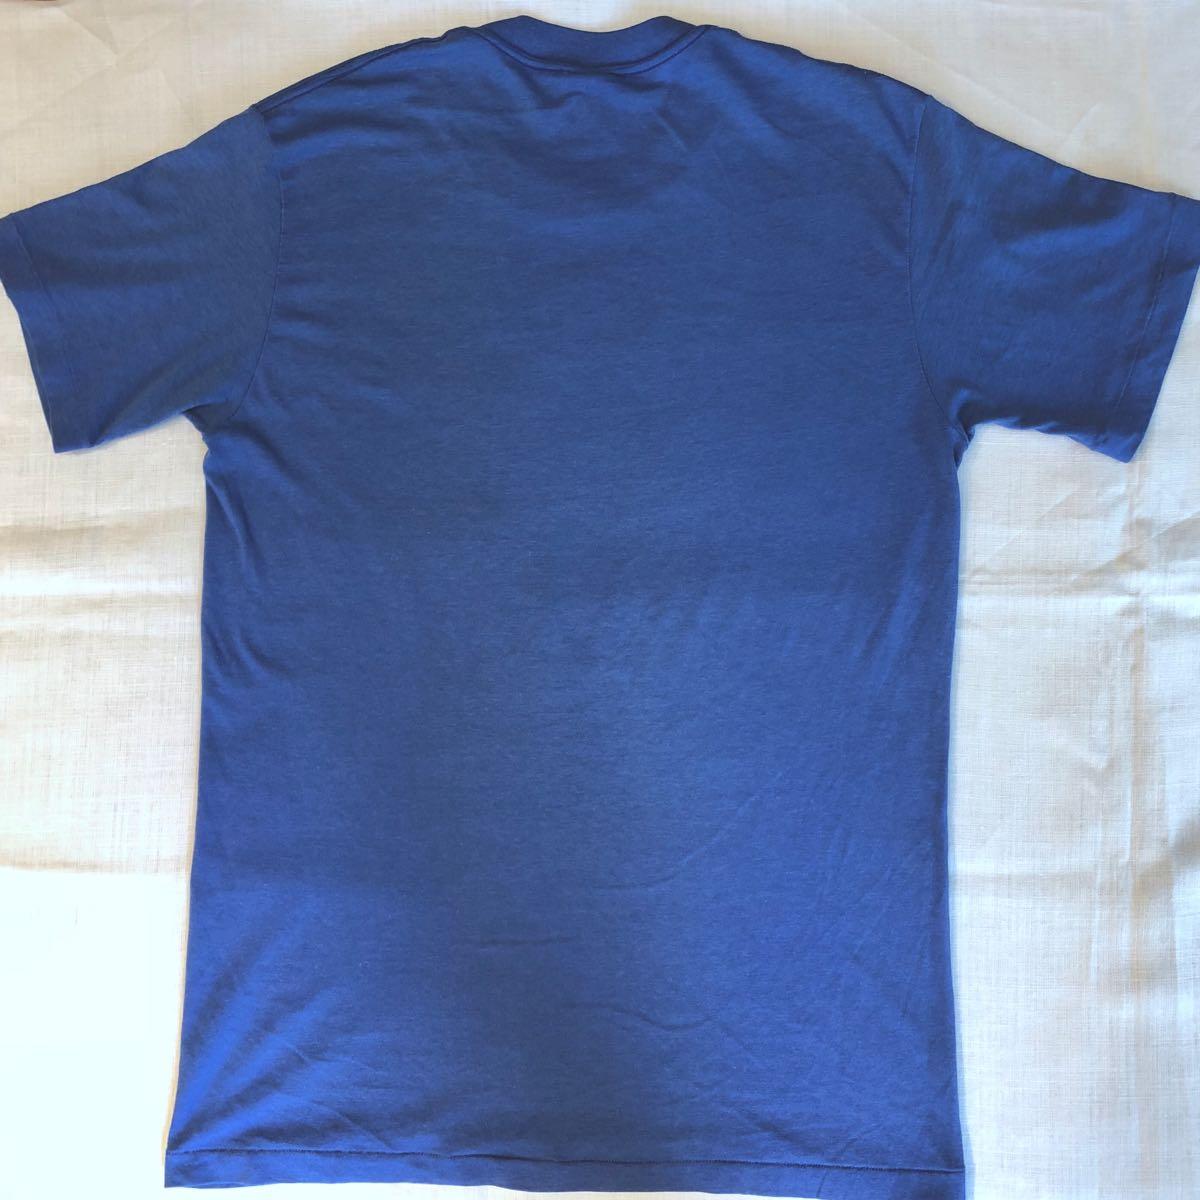 80s NIKE ATHLETICS WEST Print T-shirtナイキ プリント Tシャツ古着 古着女子 Lサイズ USA製_画像5